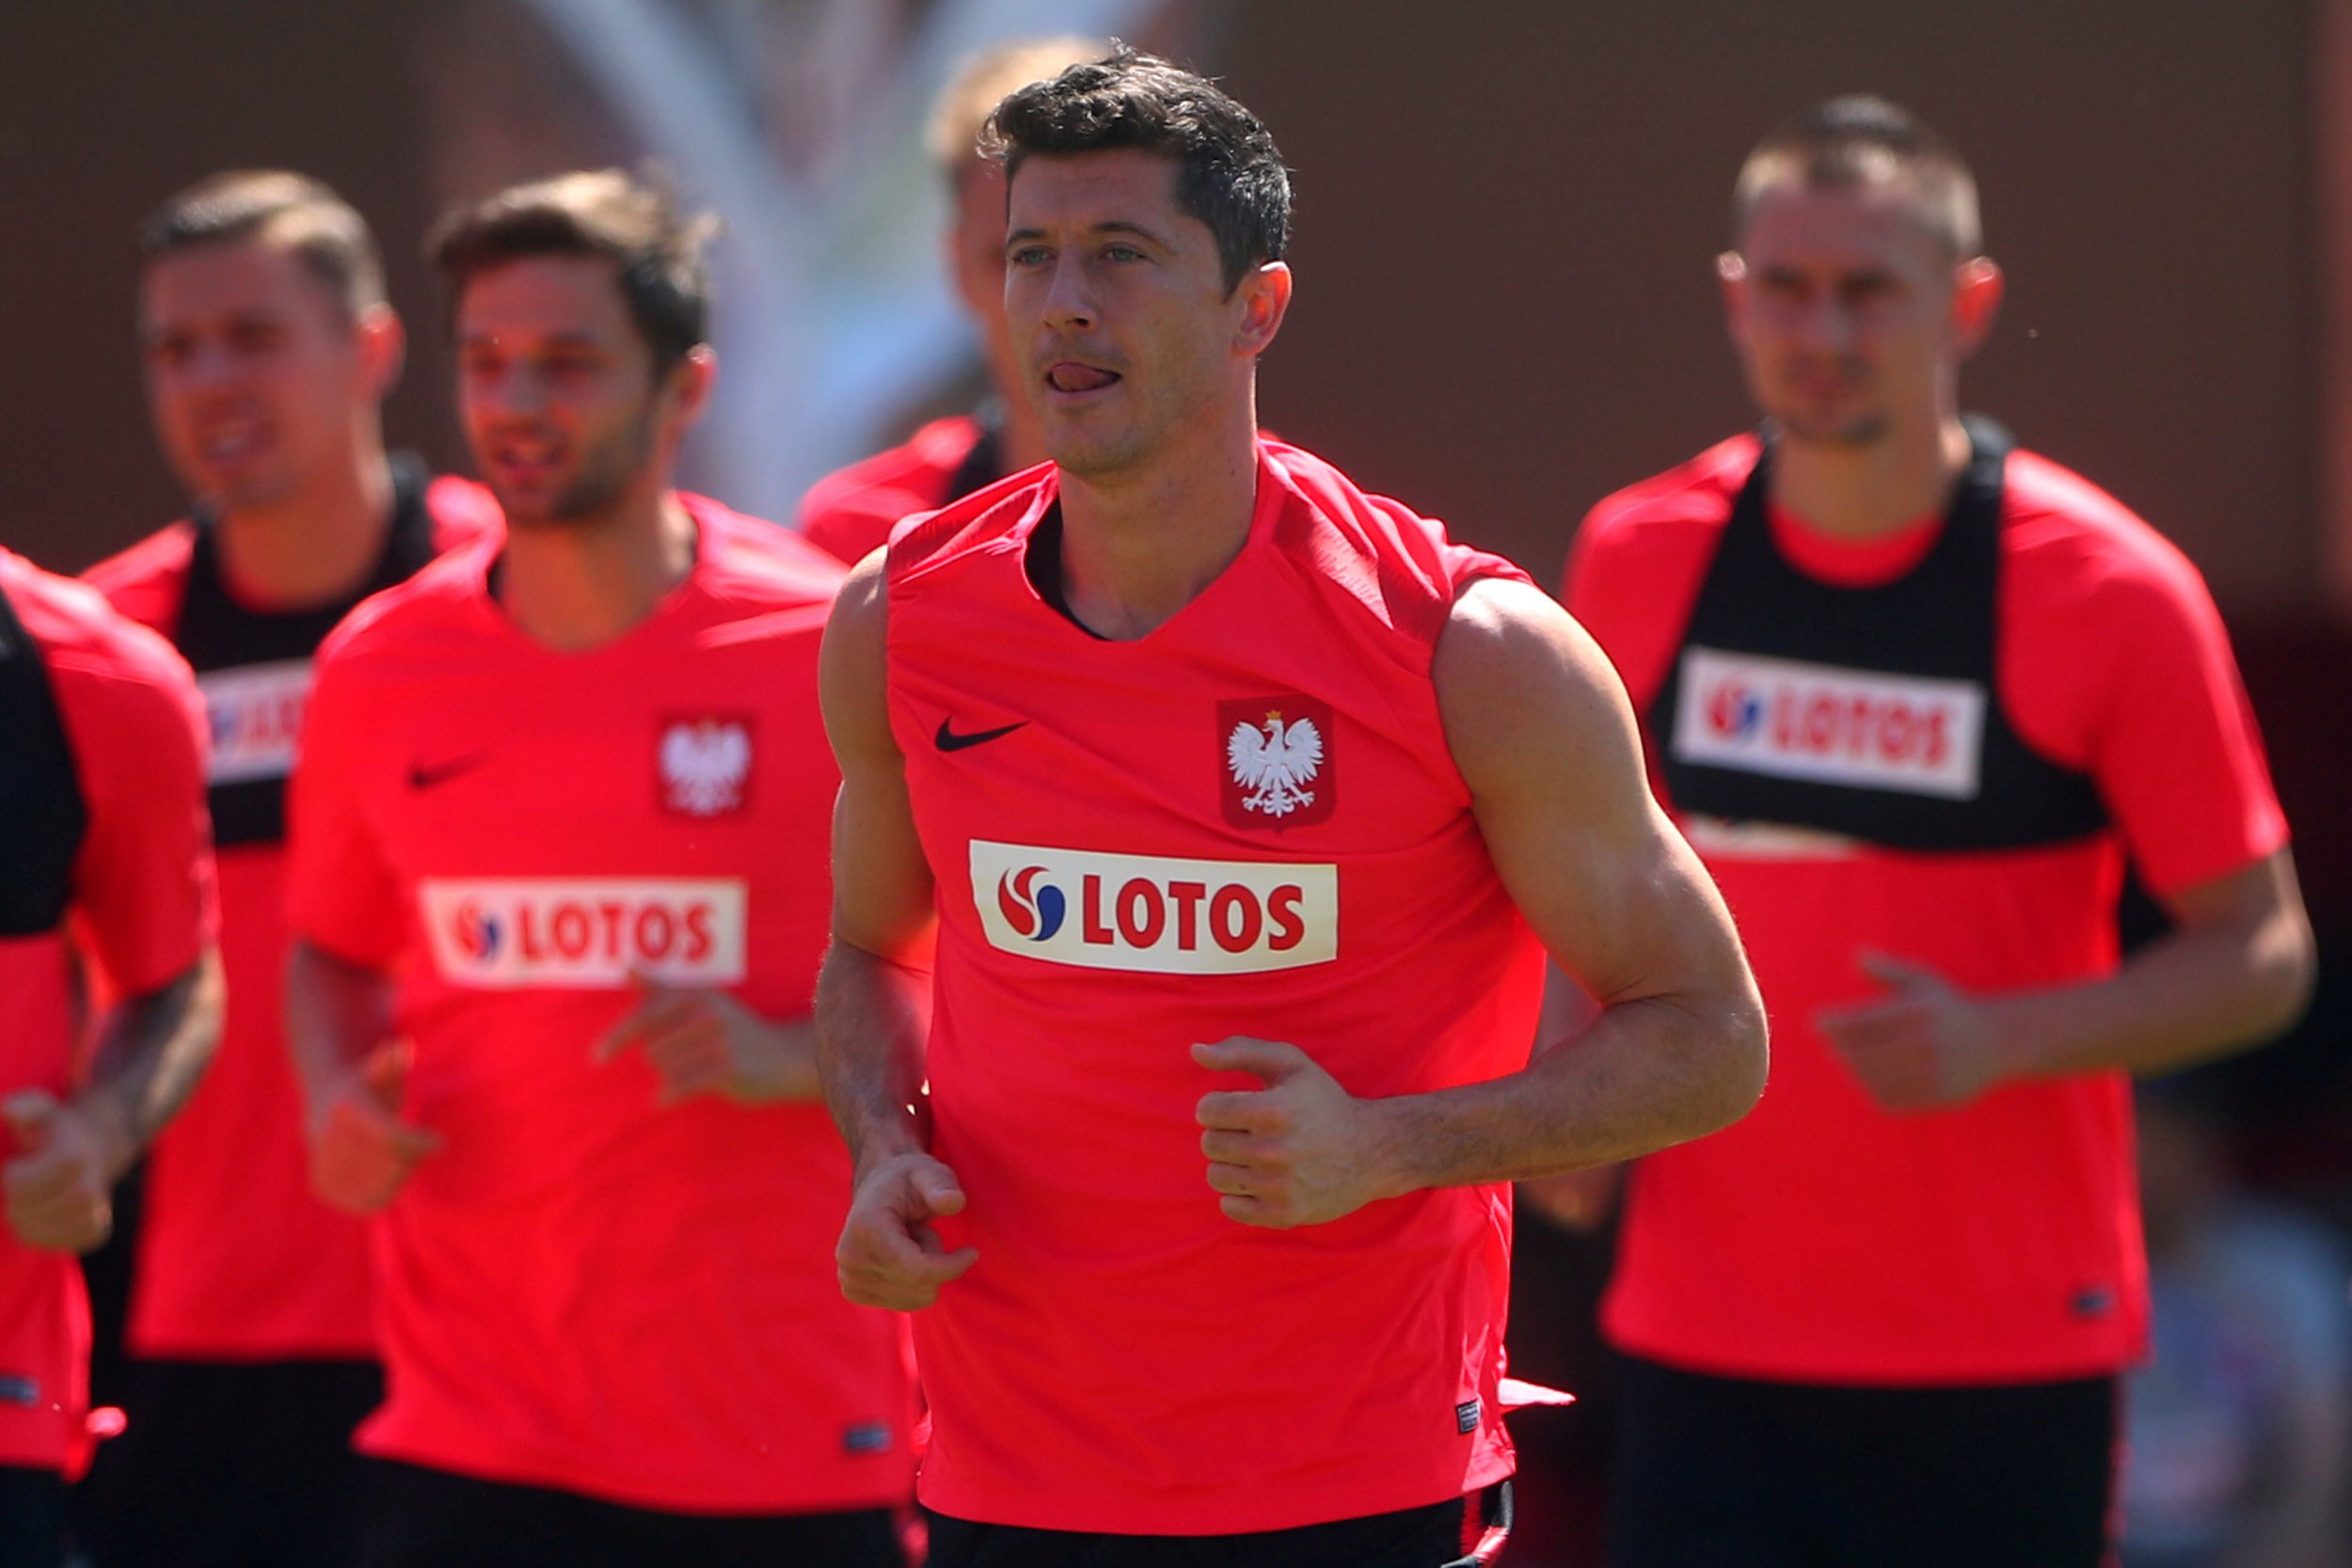 Soccer Football - World Cup - Poland Training - Poland Training Camp, Sochi, Russia - June 14, 2018 Poland's Robert Lewandowski during training REUTERS/Hannah McKay